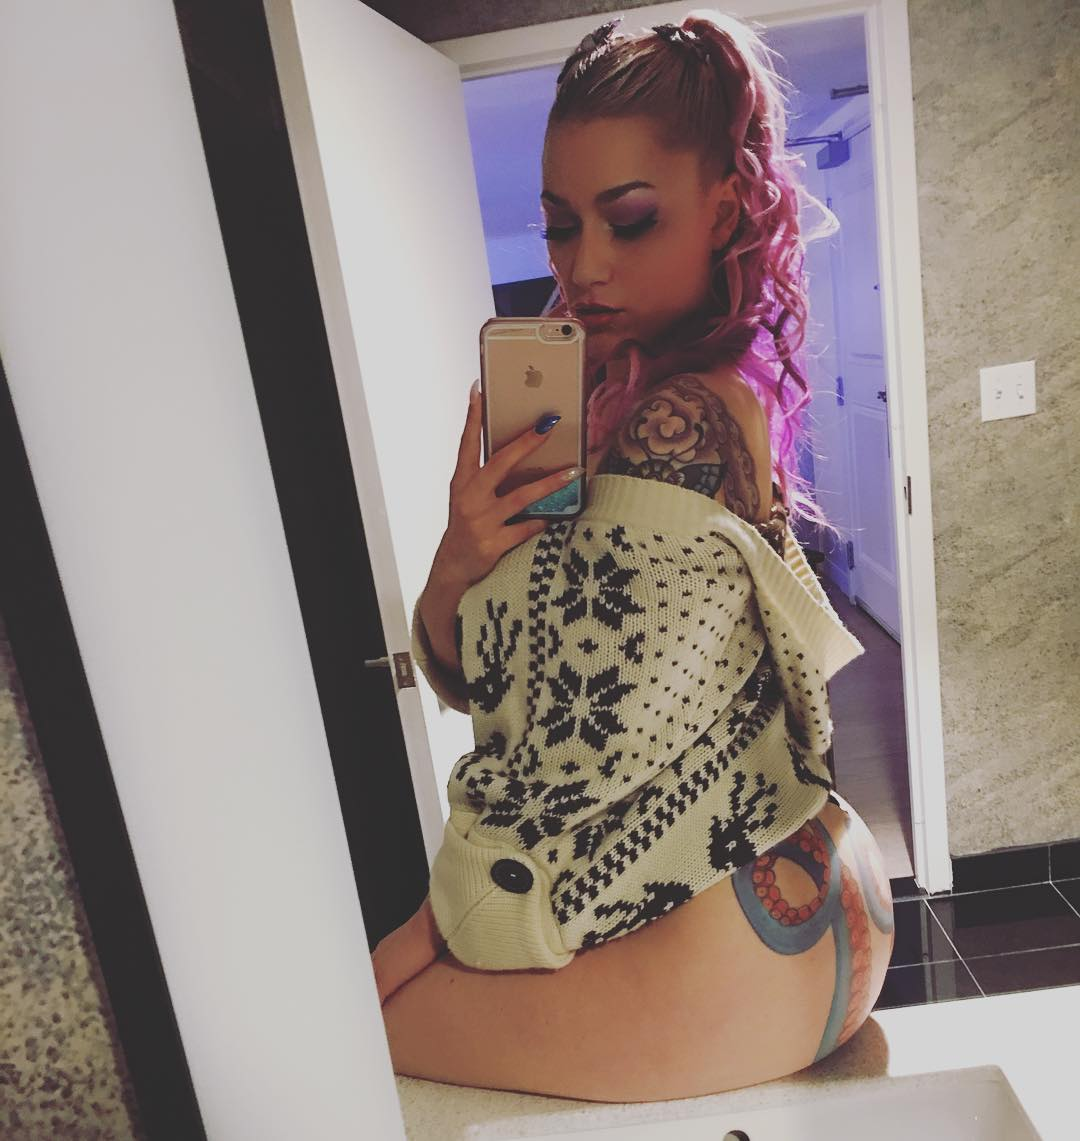 Daizha Morgann Instagram username